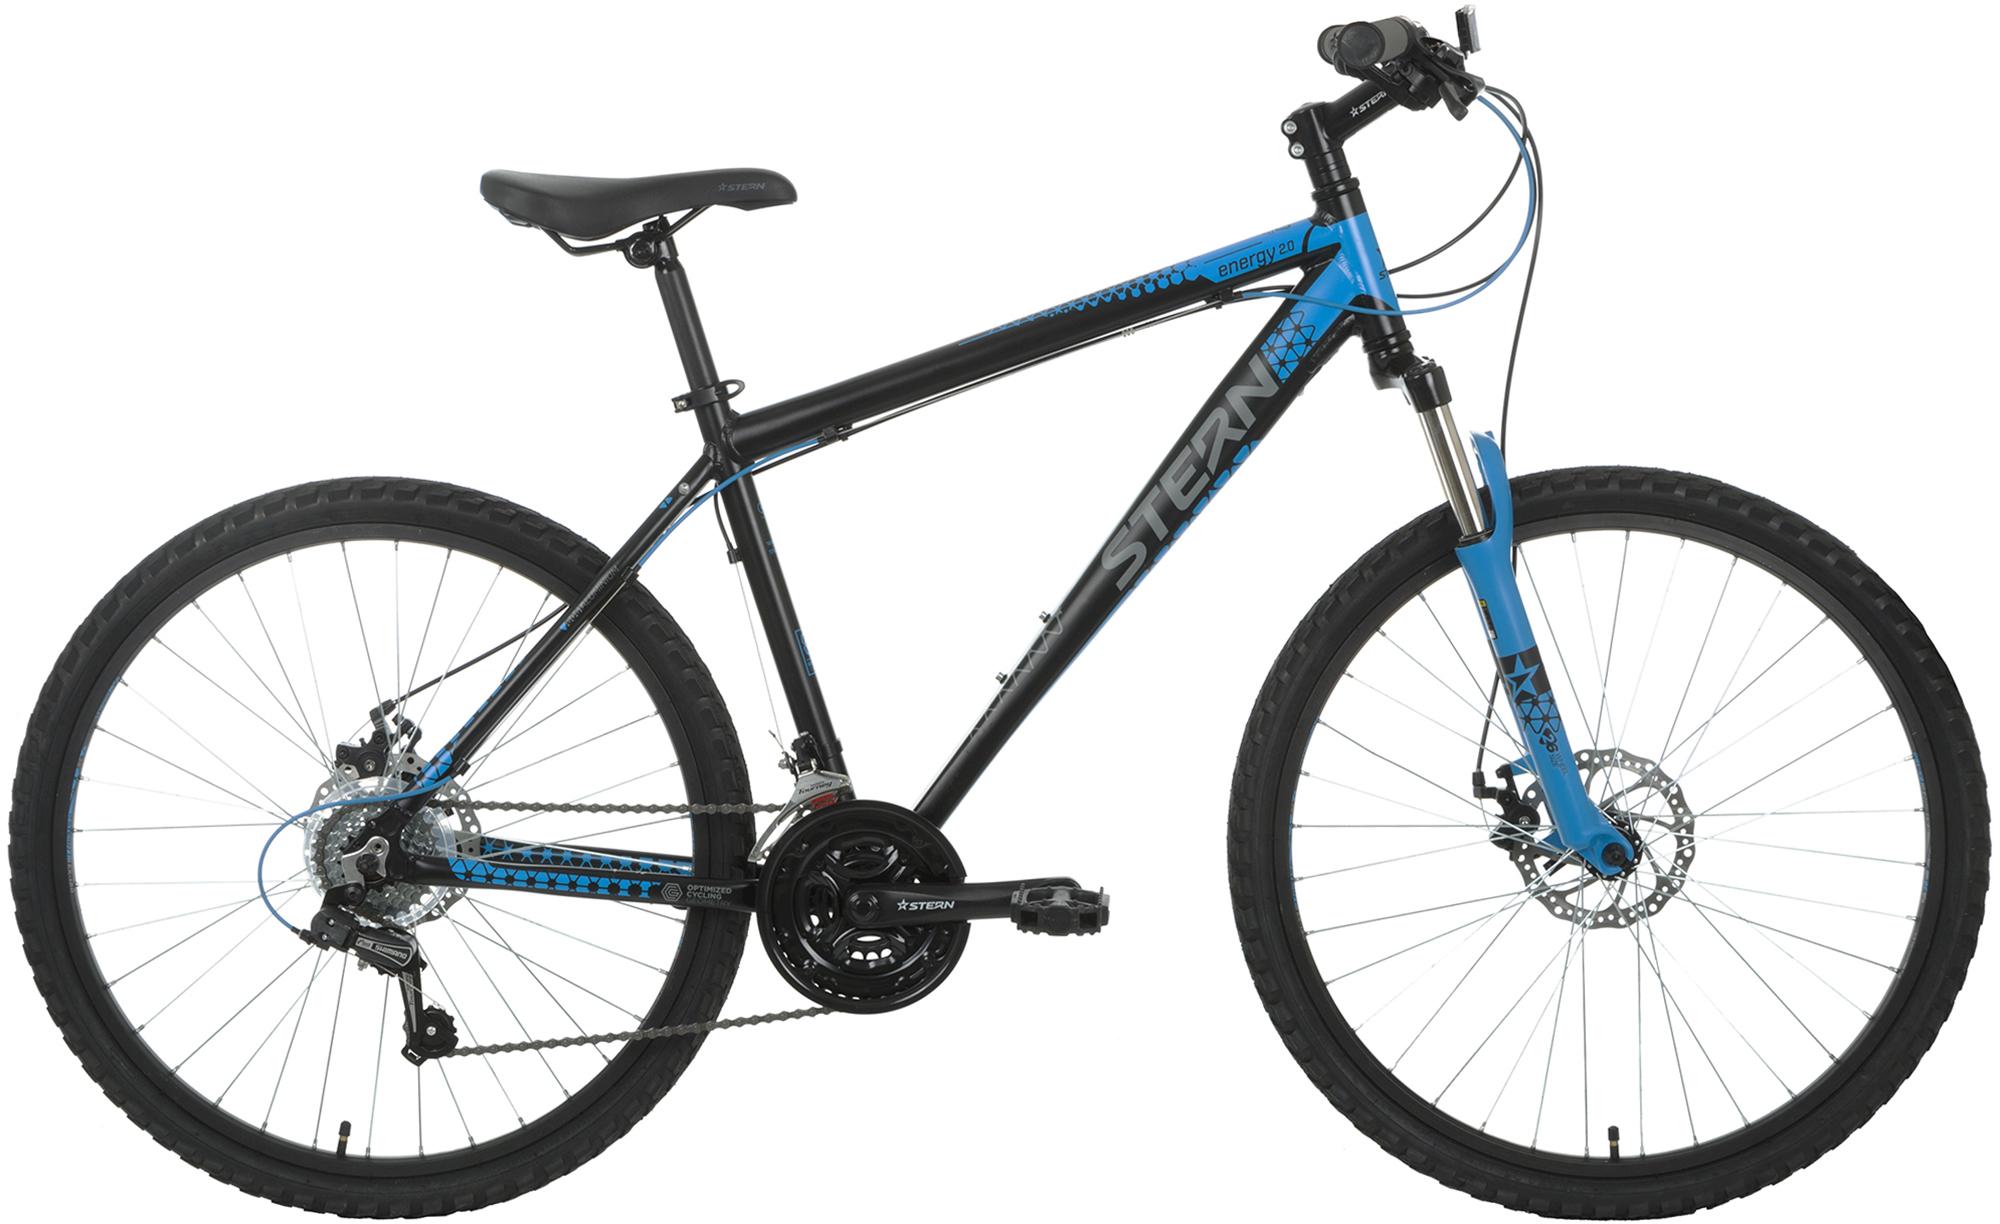 Stern Велосипед горный Stern Energy 2.0 26'' stern корзина велосипедная детская stern